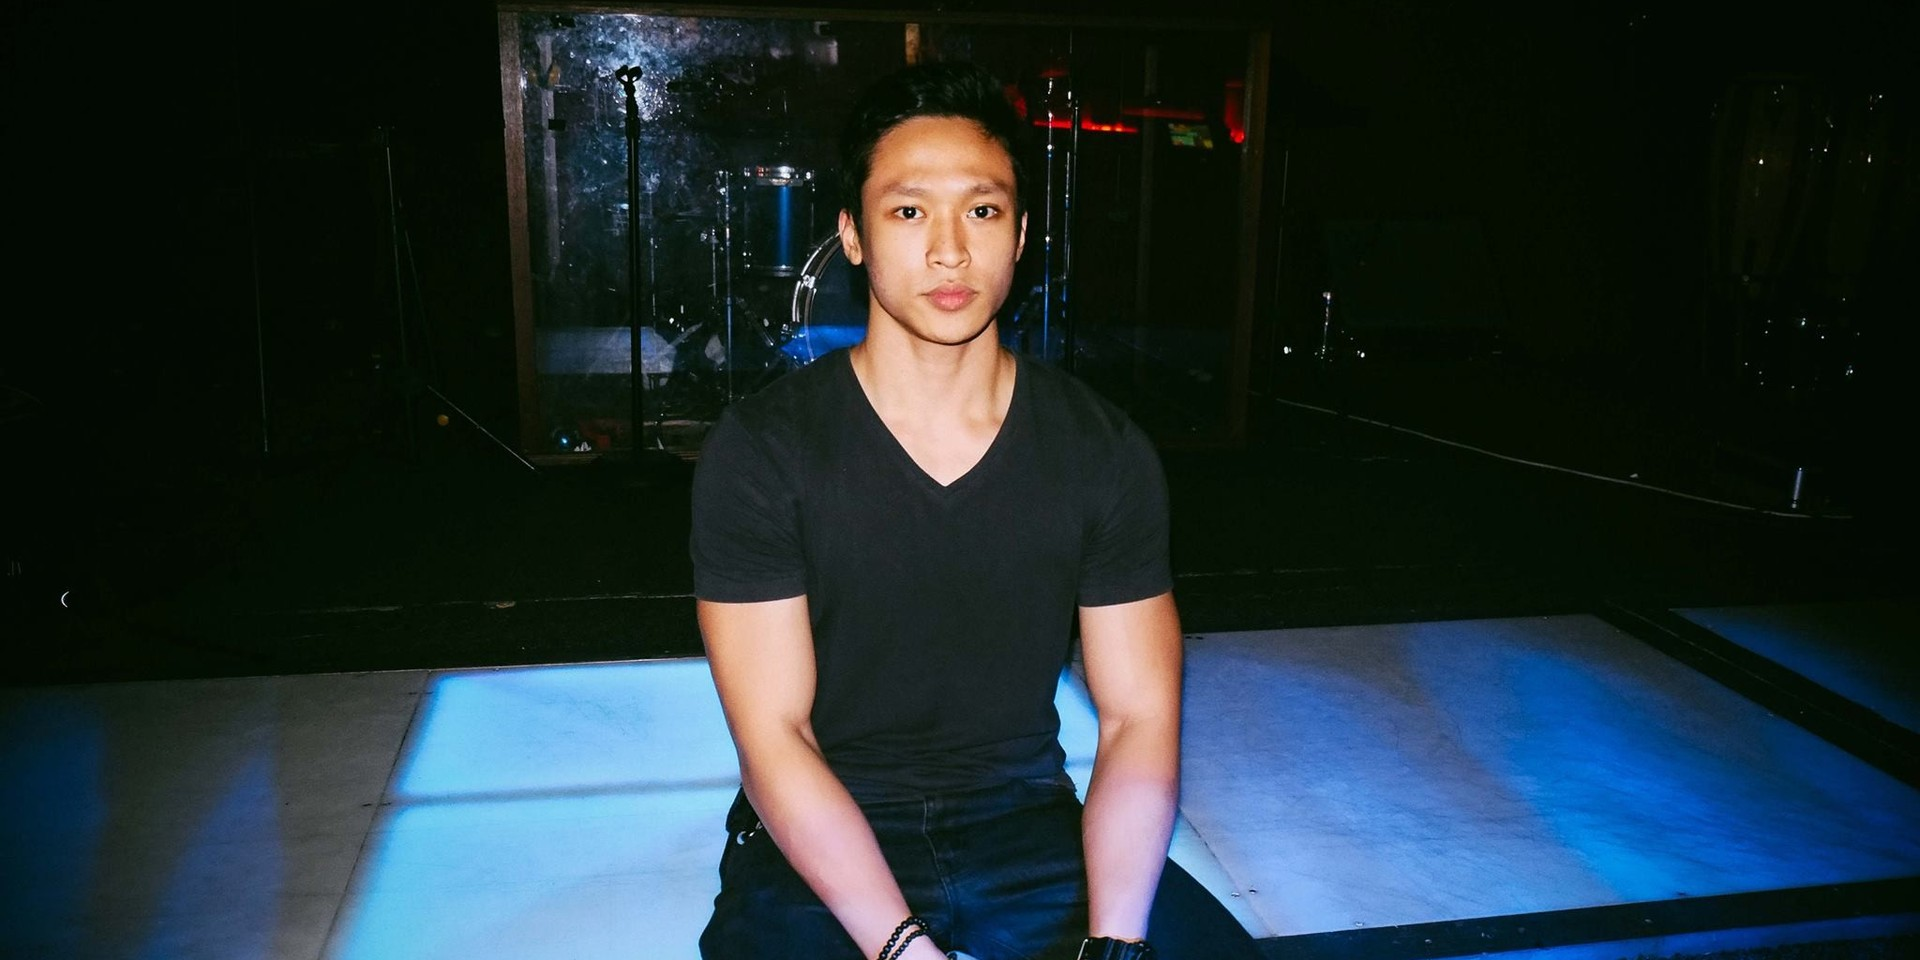 Renowned Singaporean drummer Junaidi Kusnong partners with wife to launch new jamming studio